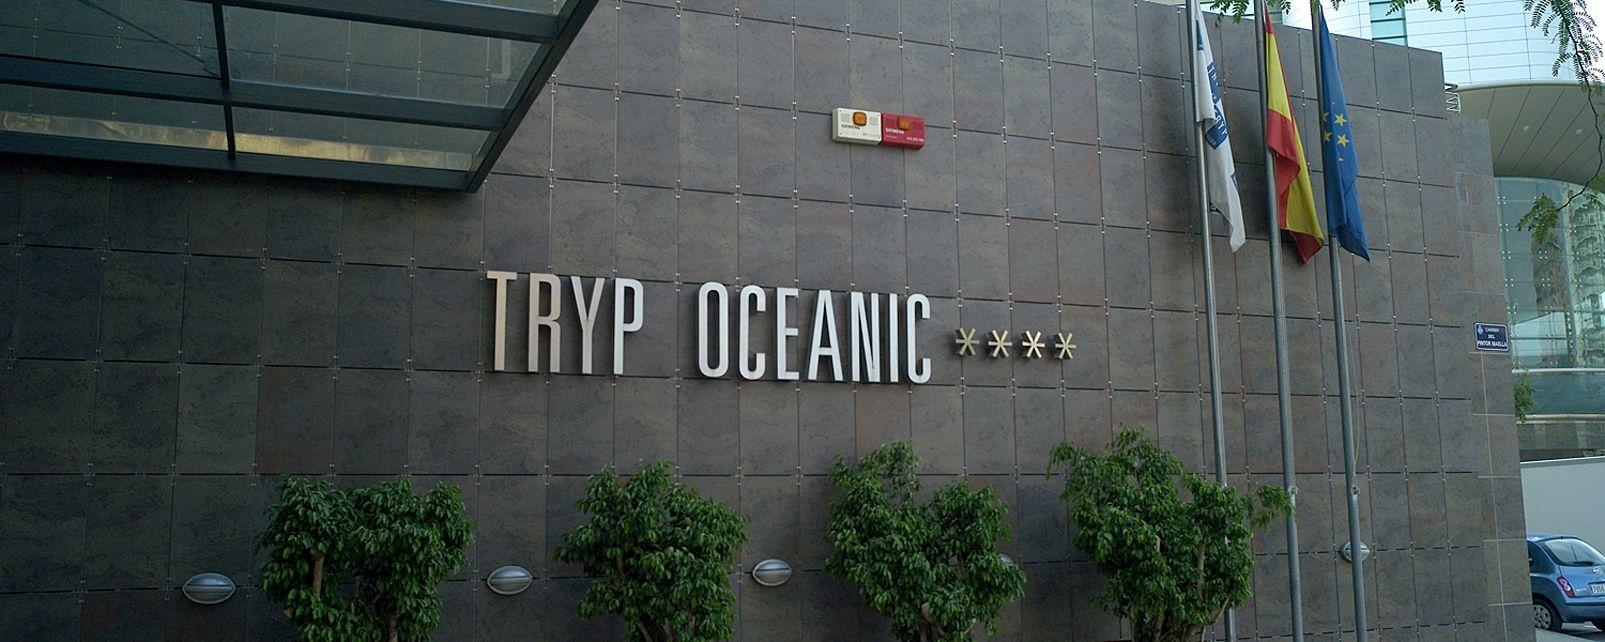 Hôtel Tryp Oceanic